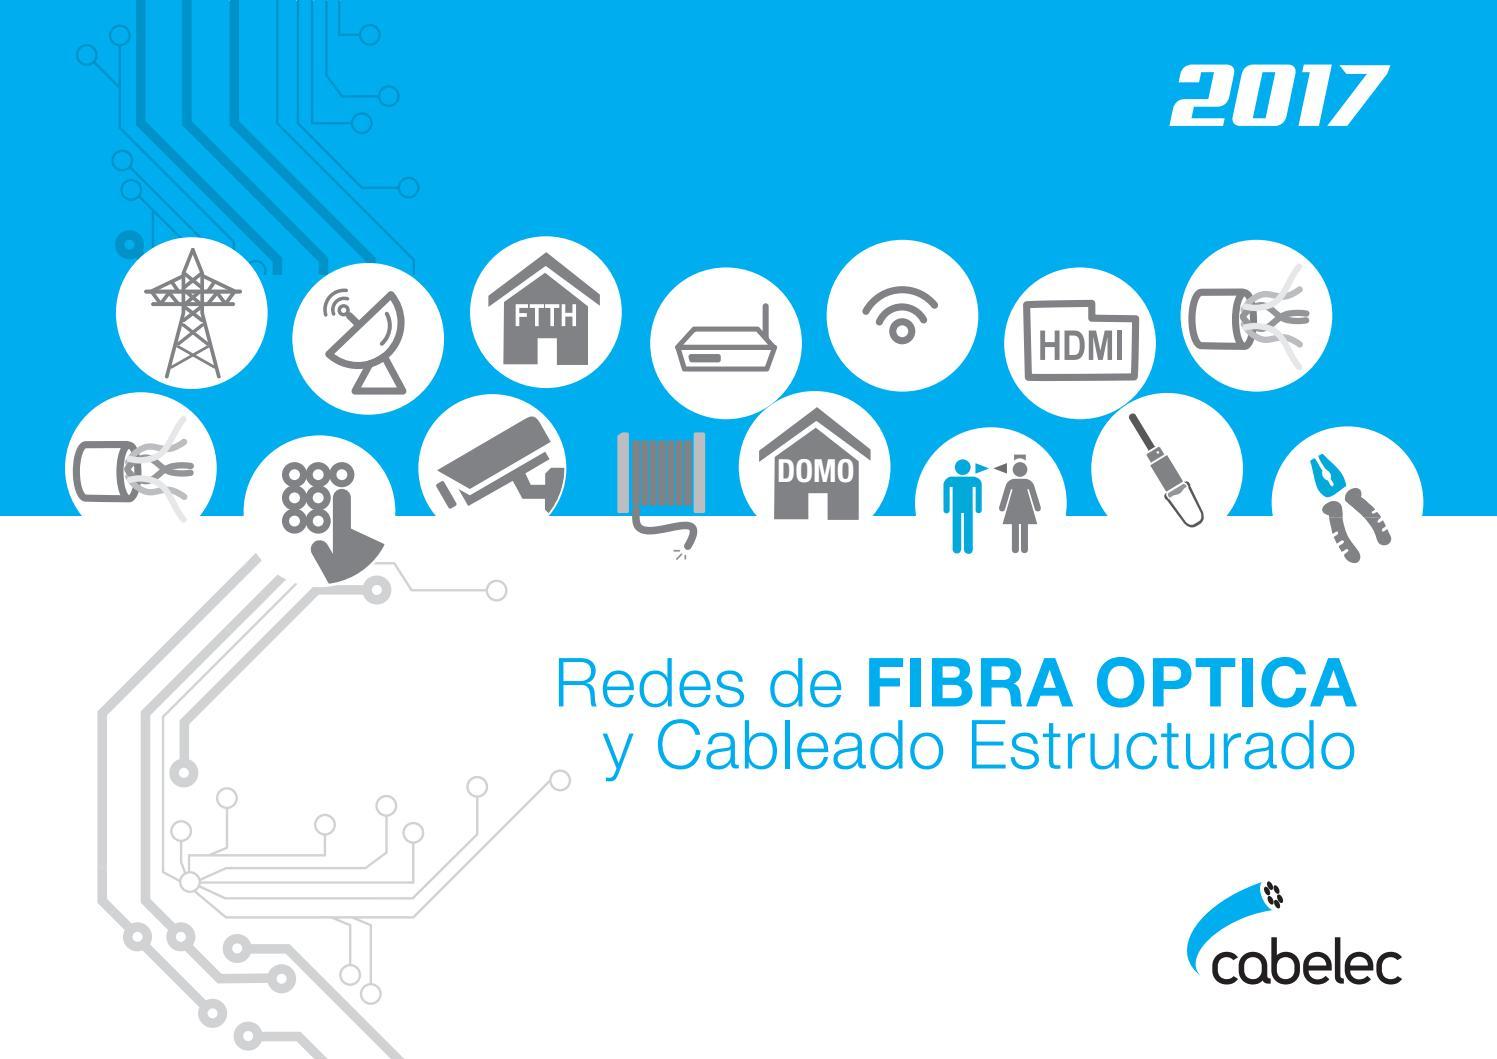 ca190b0b5b CATALOGO REDES DE FIBRA OPTICA Y CABLEADO ESTRUCTURADO by  cabelecelectronica - issuu